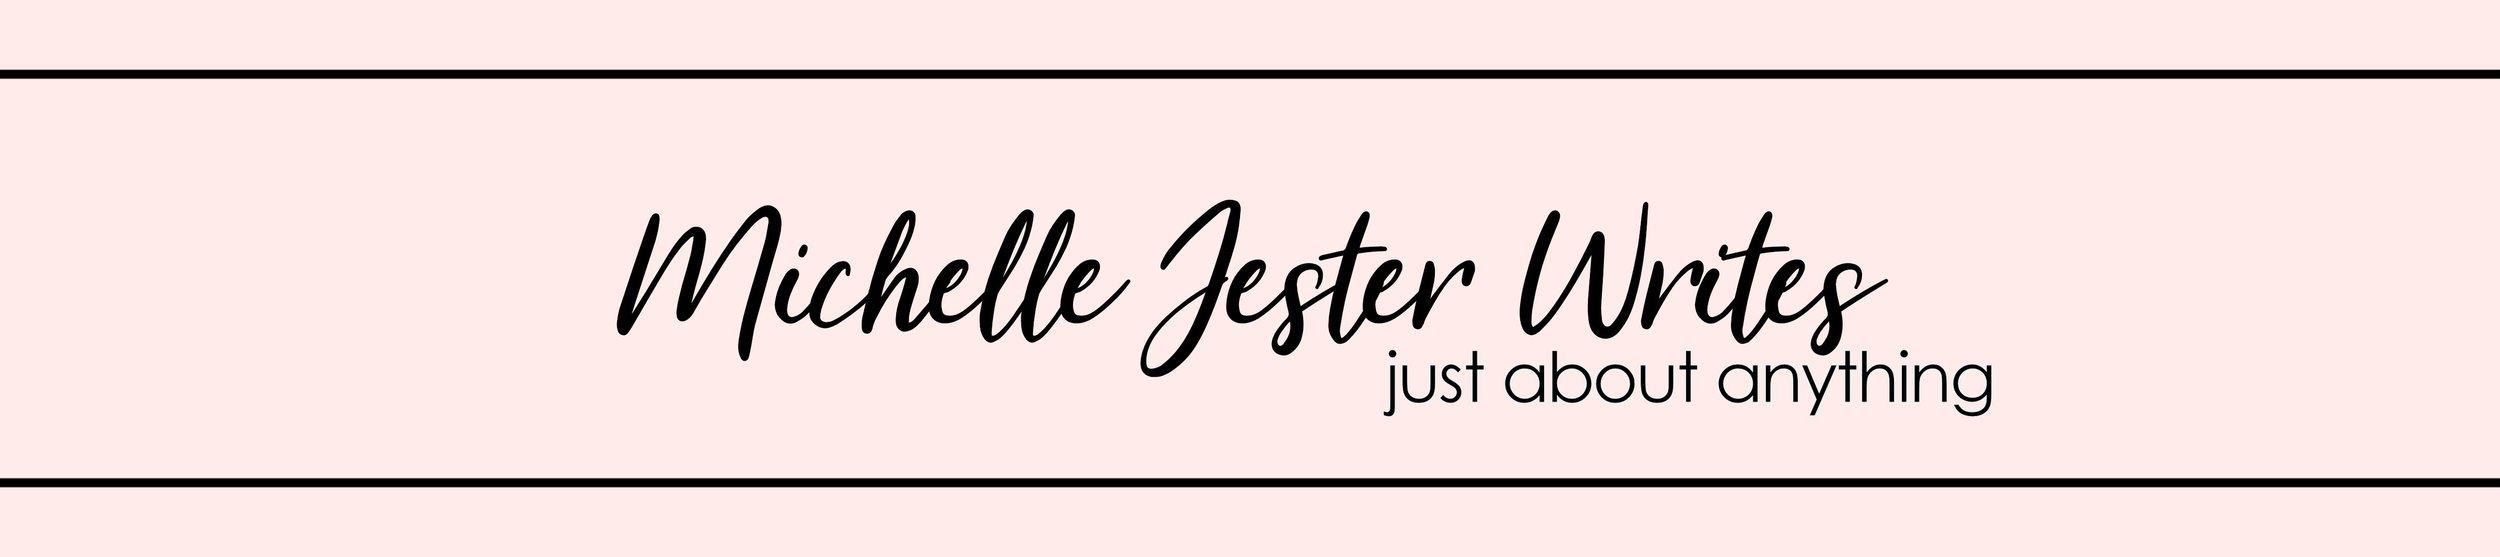 Michelle Jester writes MAIN web banner1 a lighter.jpg